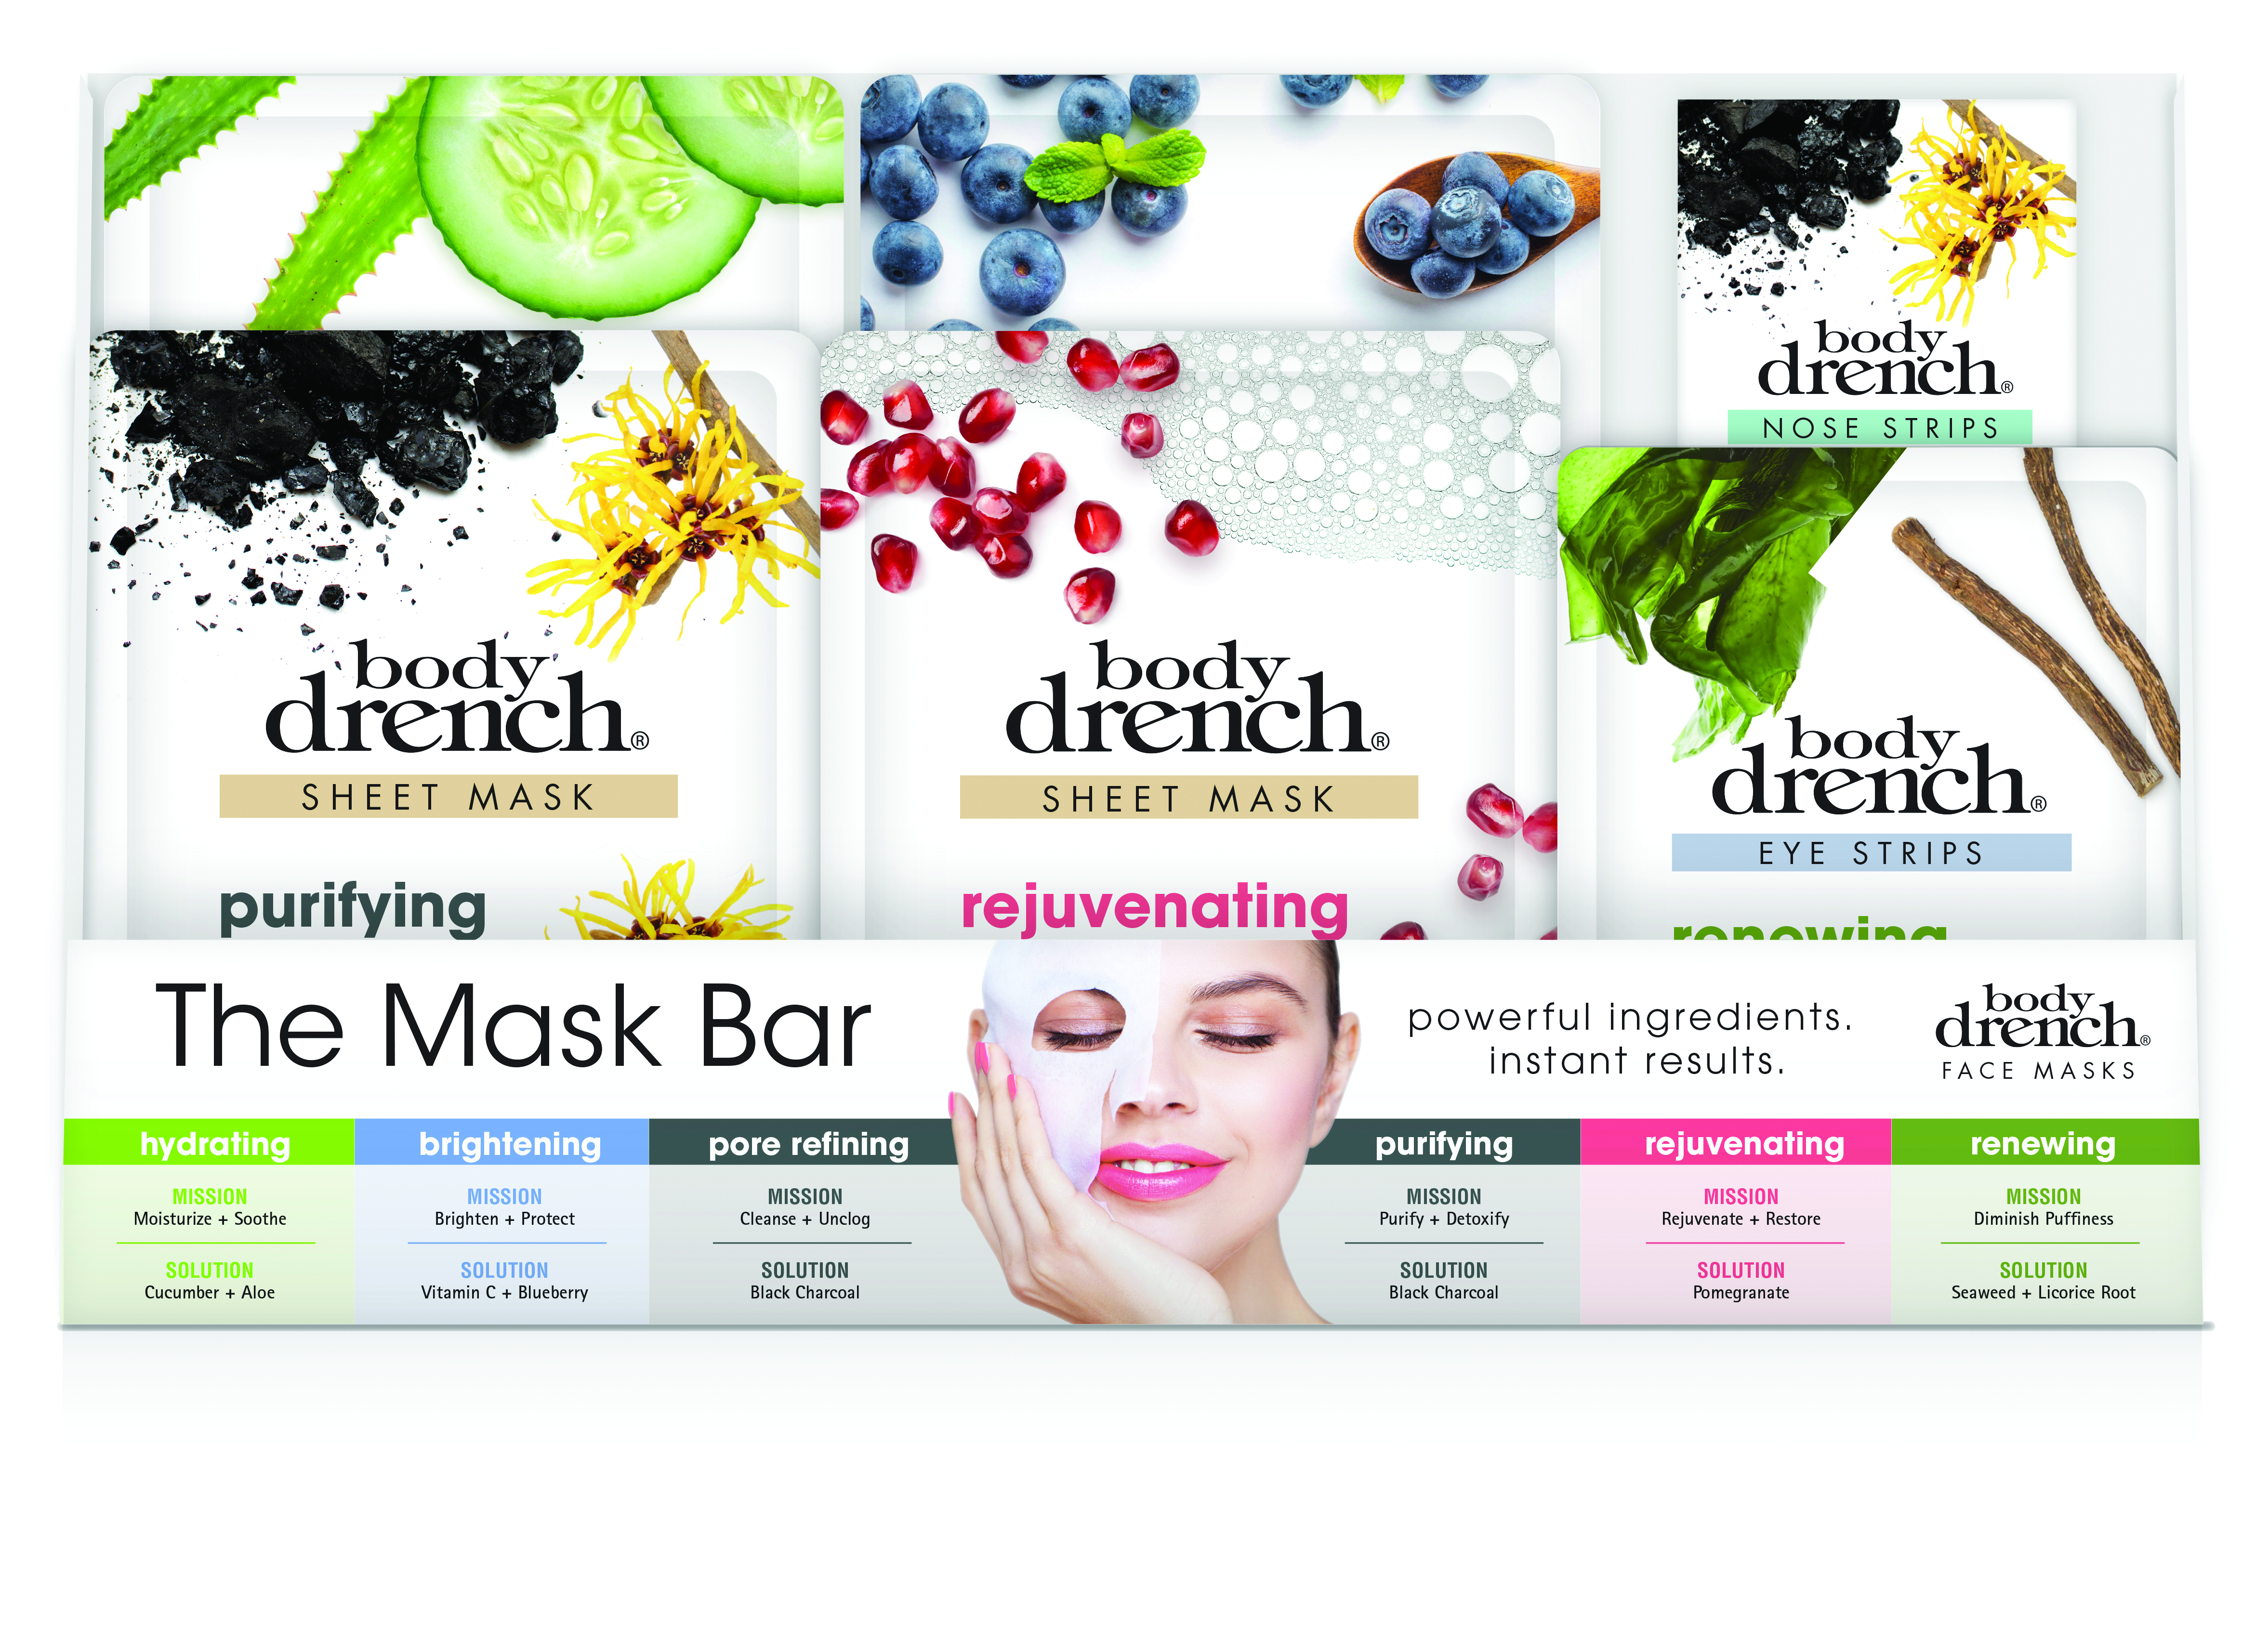 Sheet Masks and Strips